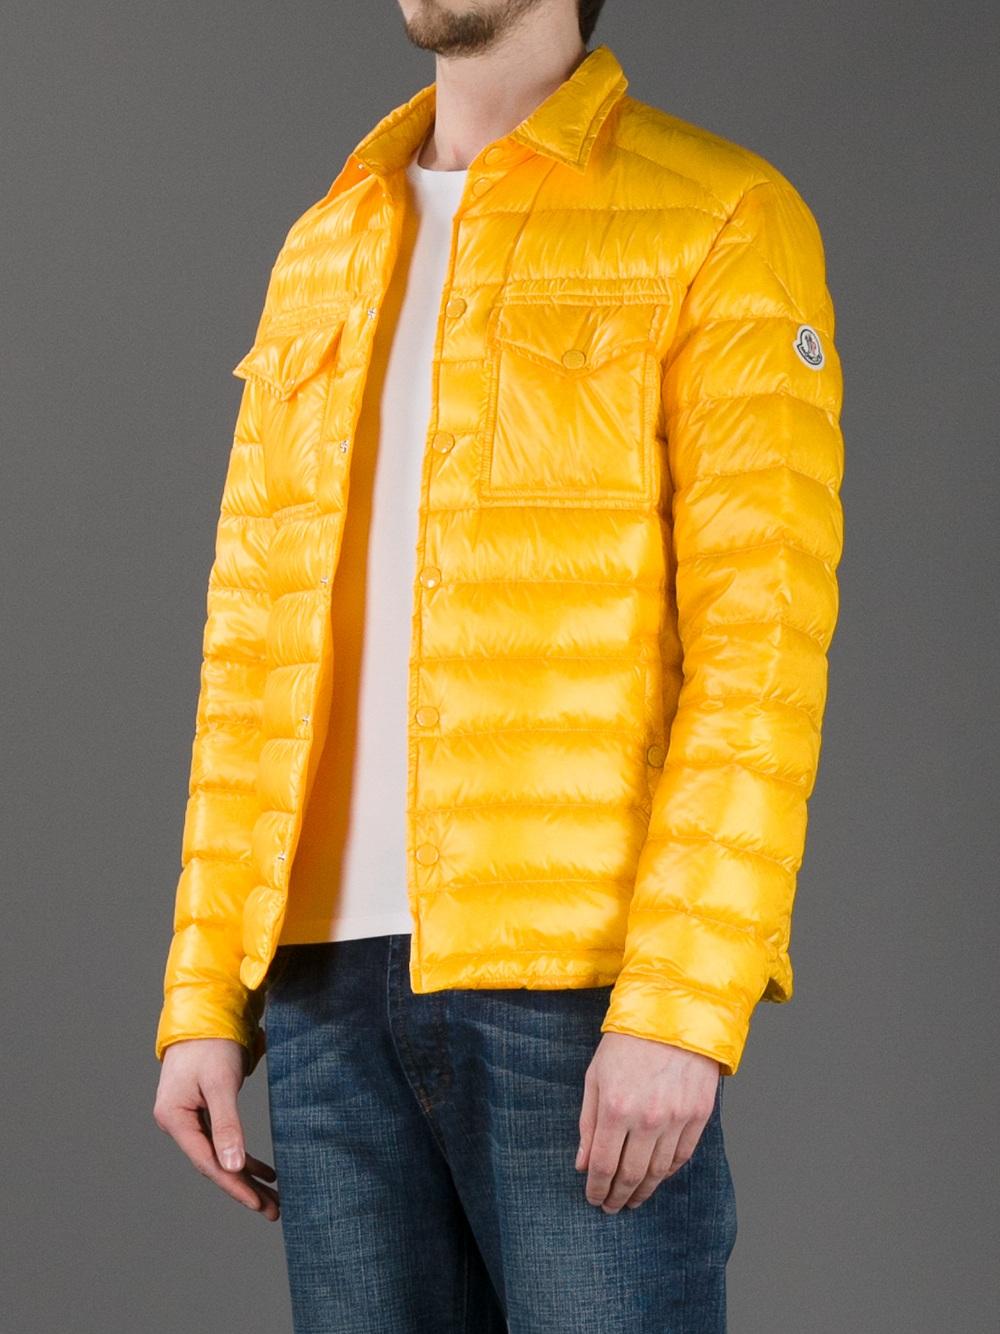 yellow moncler gilet